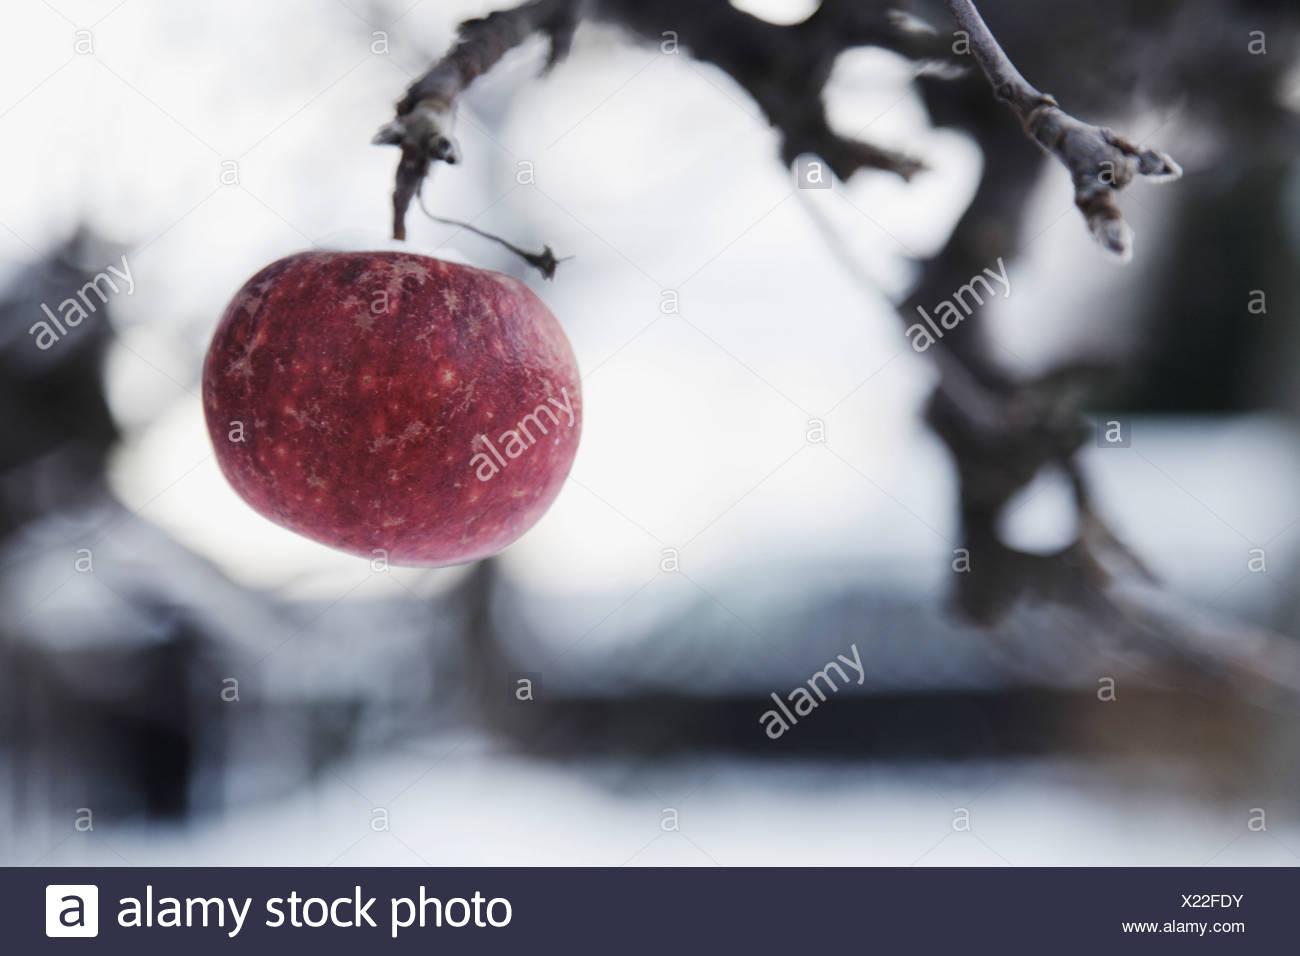 Last apple hanging on to tree - Stock Image